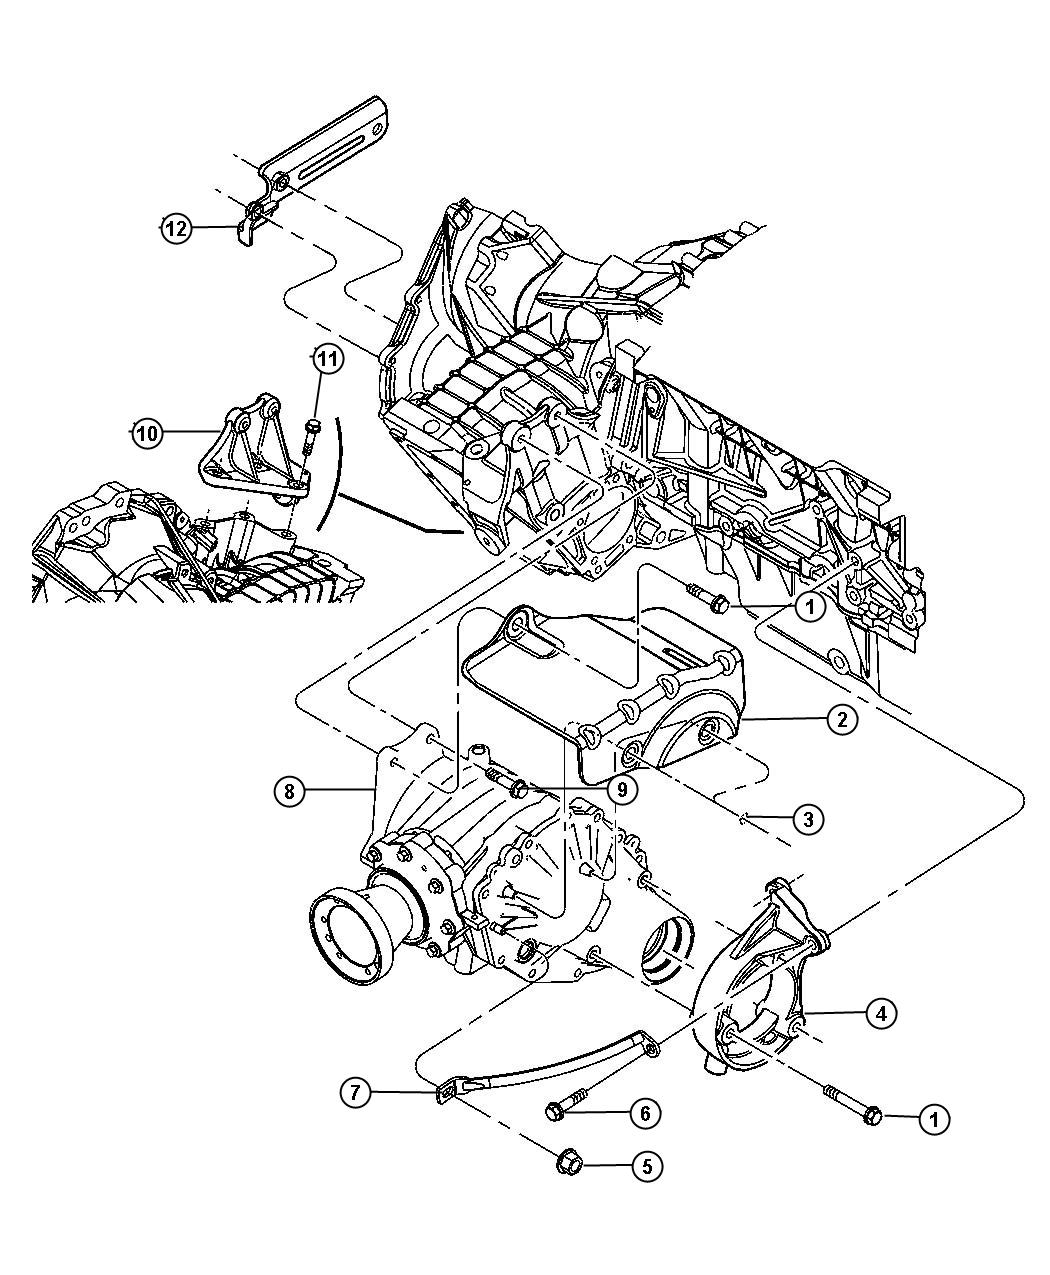 2004 chrysler pacifica motor mount diagram